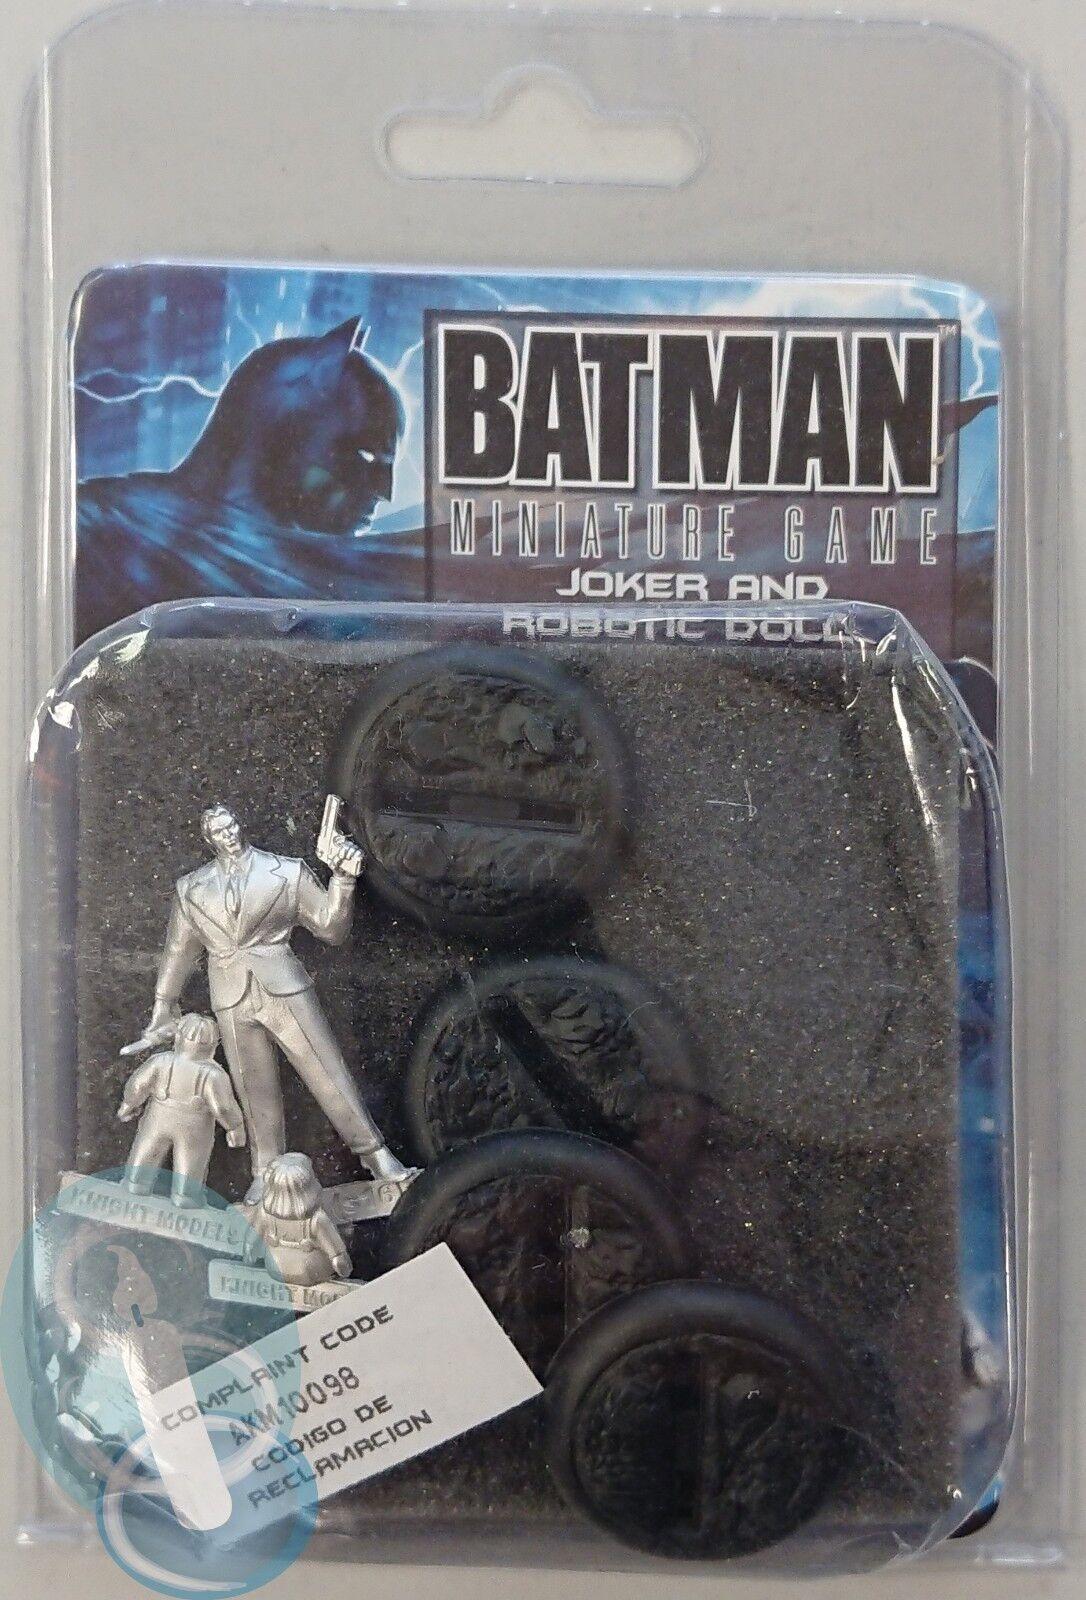 Joker And Robotic Dolls  Batman Miniature Game Knight Models